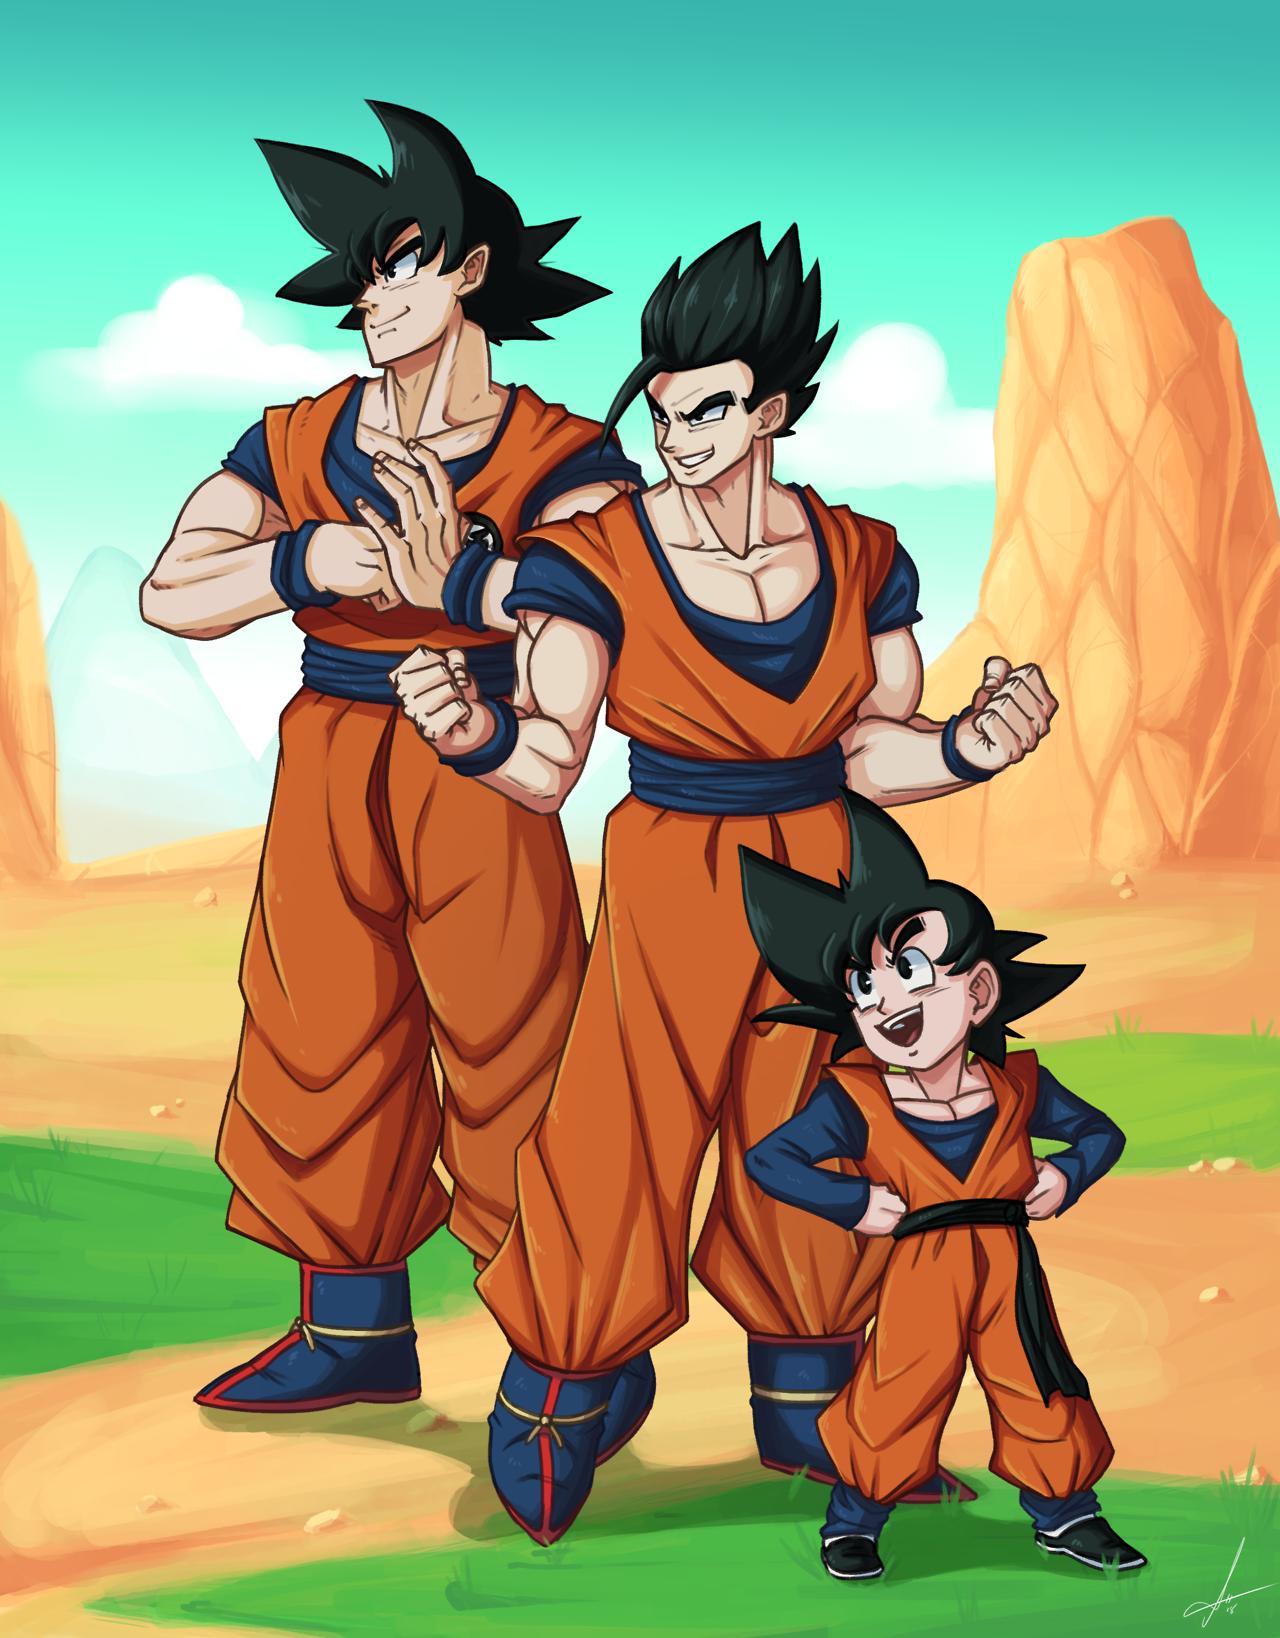 Xxx dragon com ball Goku gohan